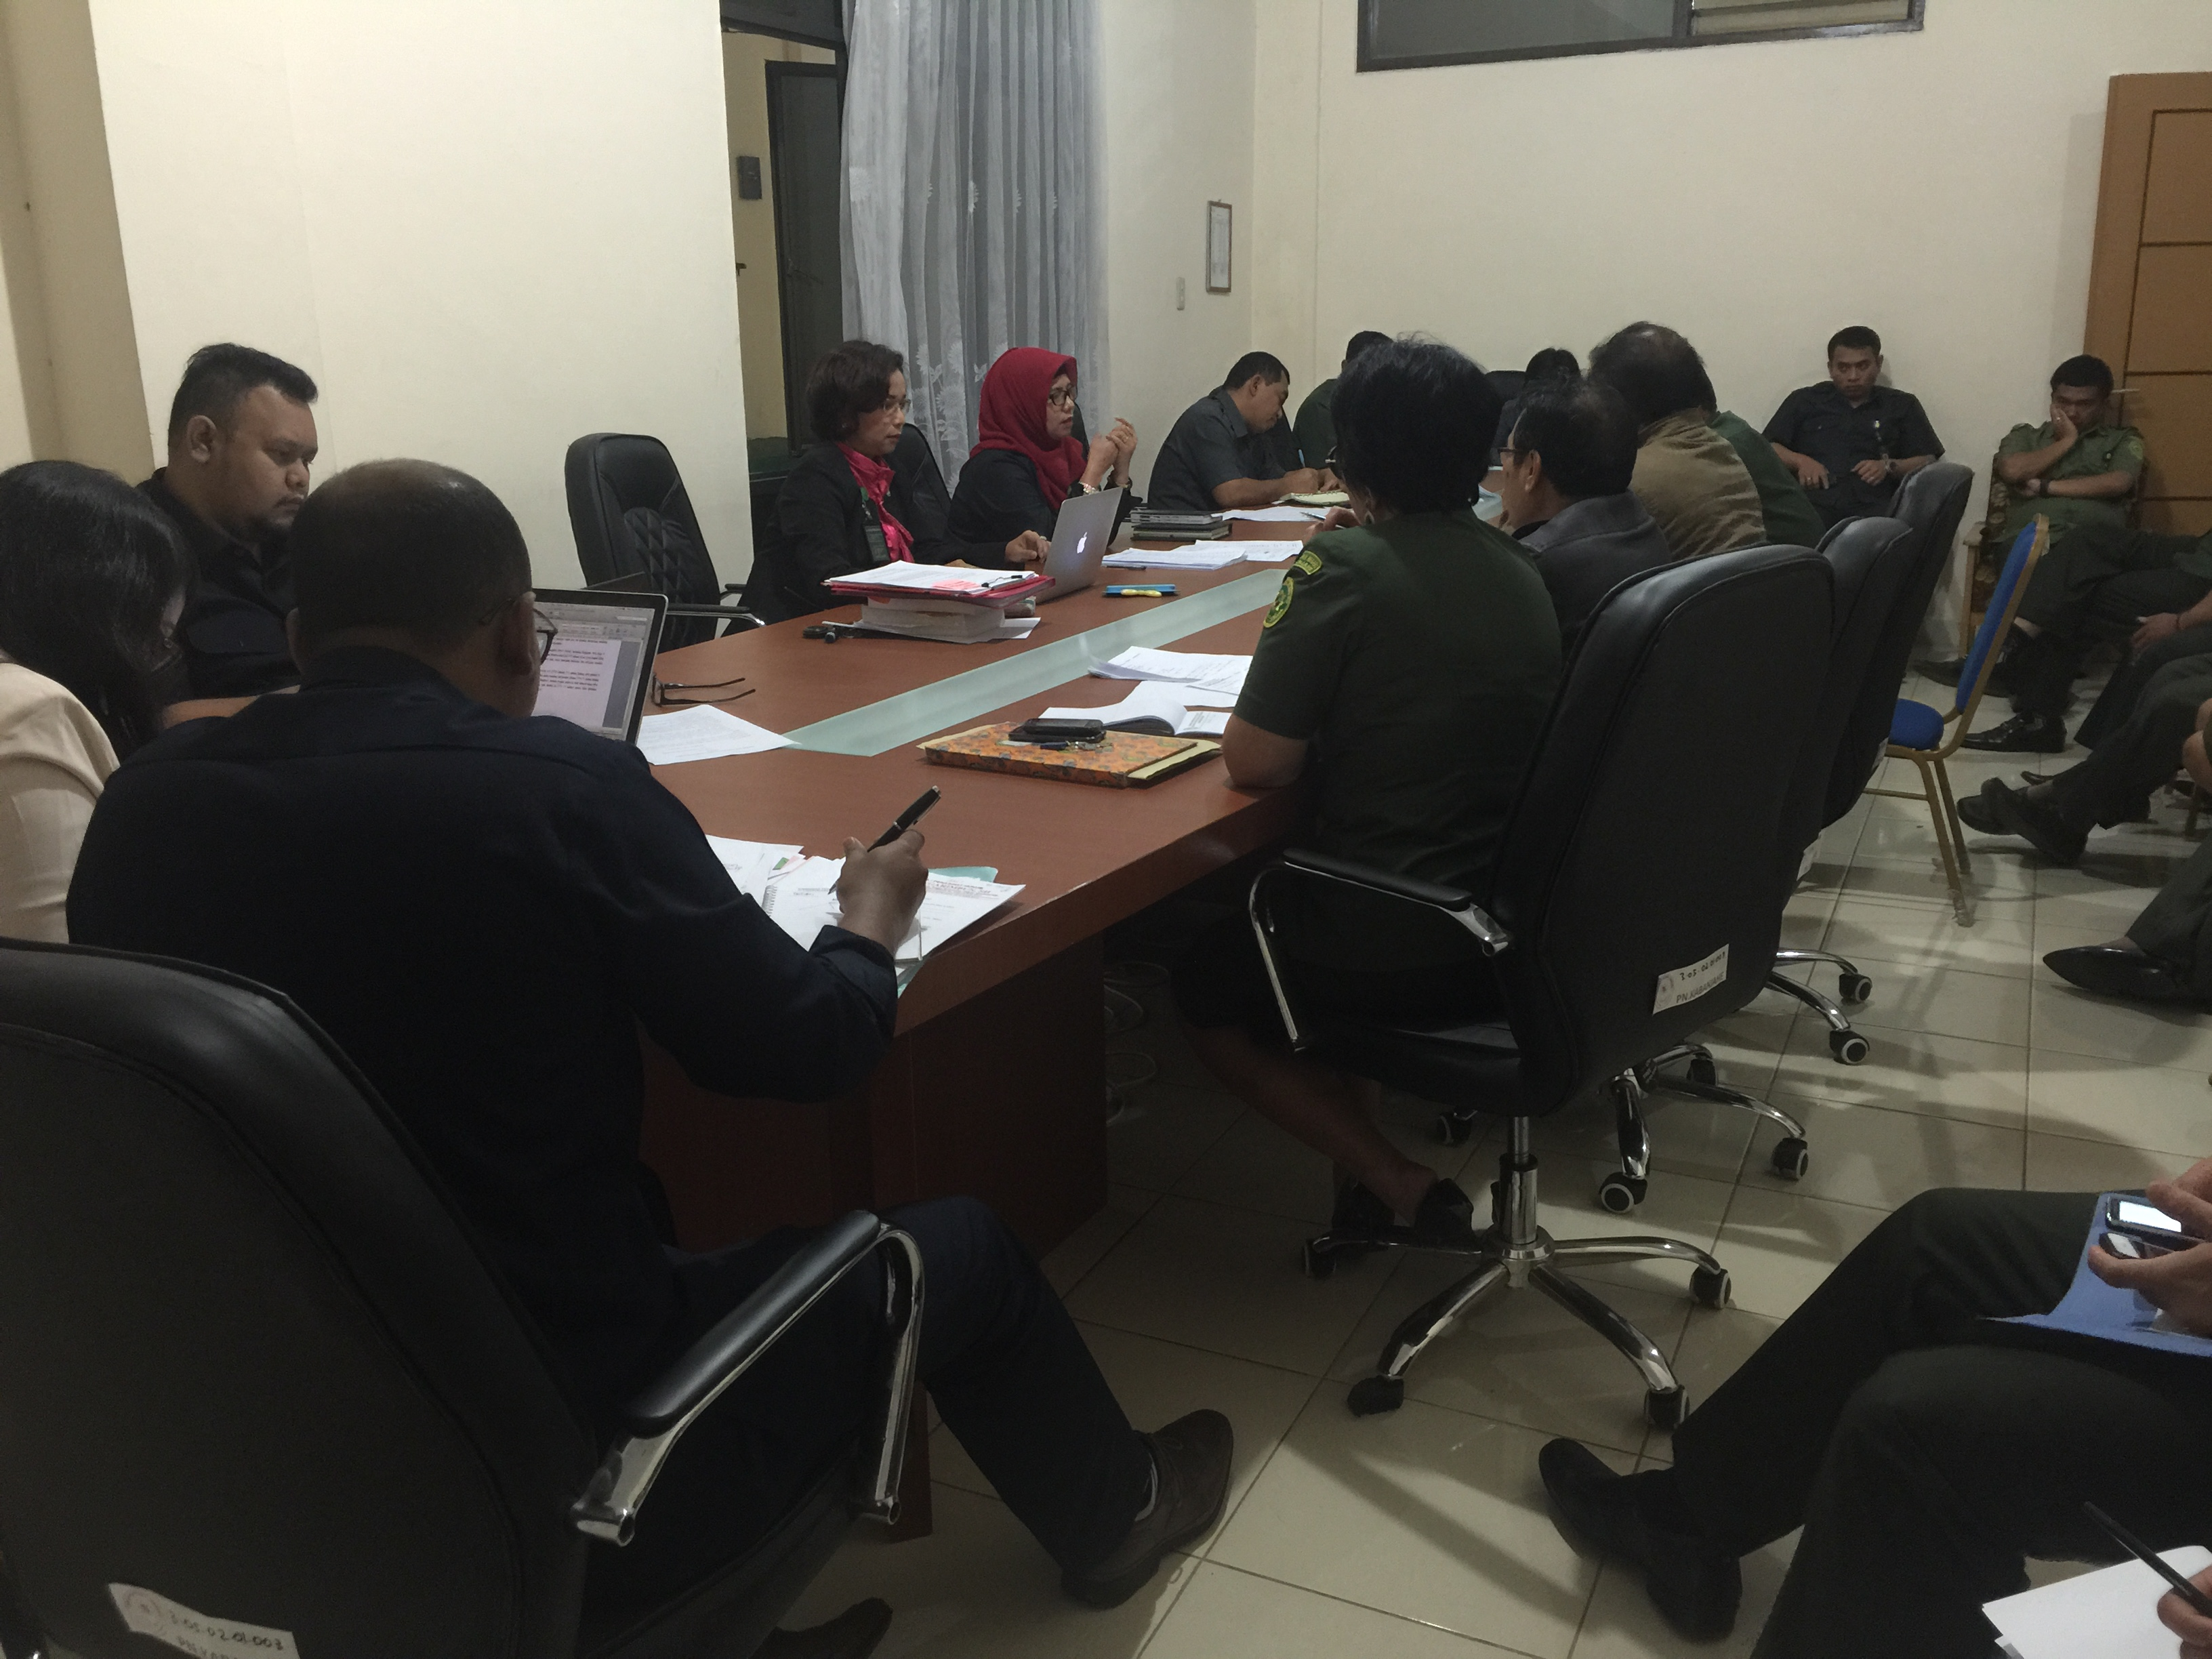 Rapat Bulan September  Pengadilan Negeri Kabanjahe Tahun 2016